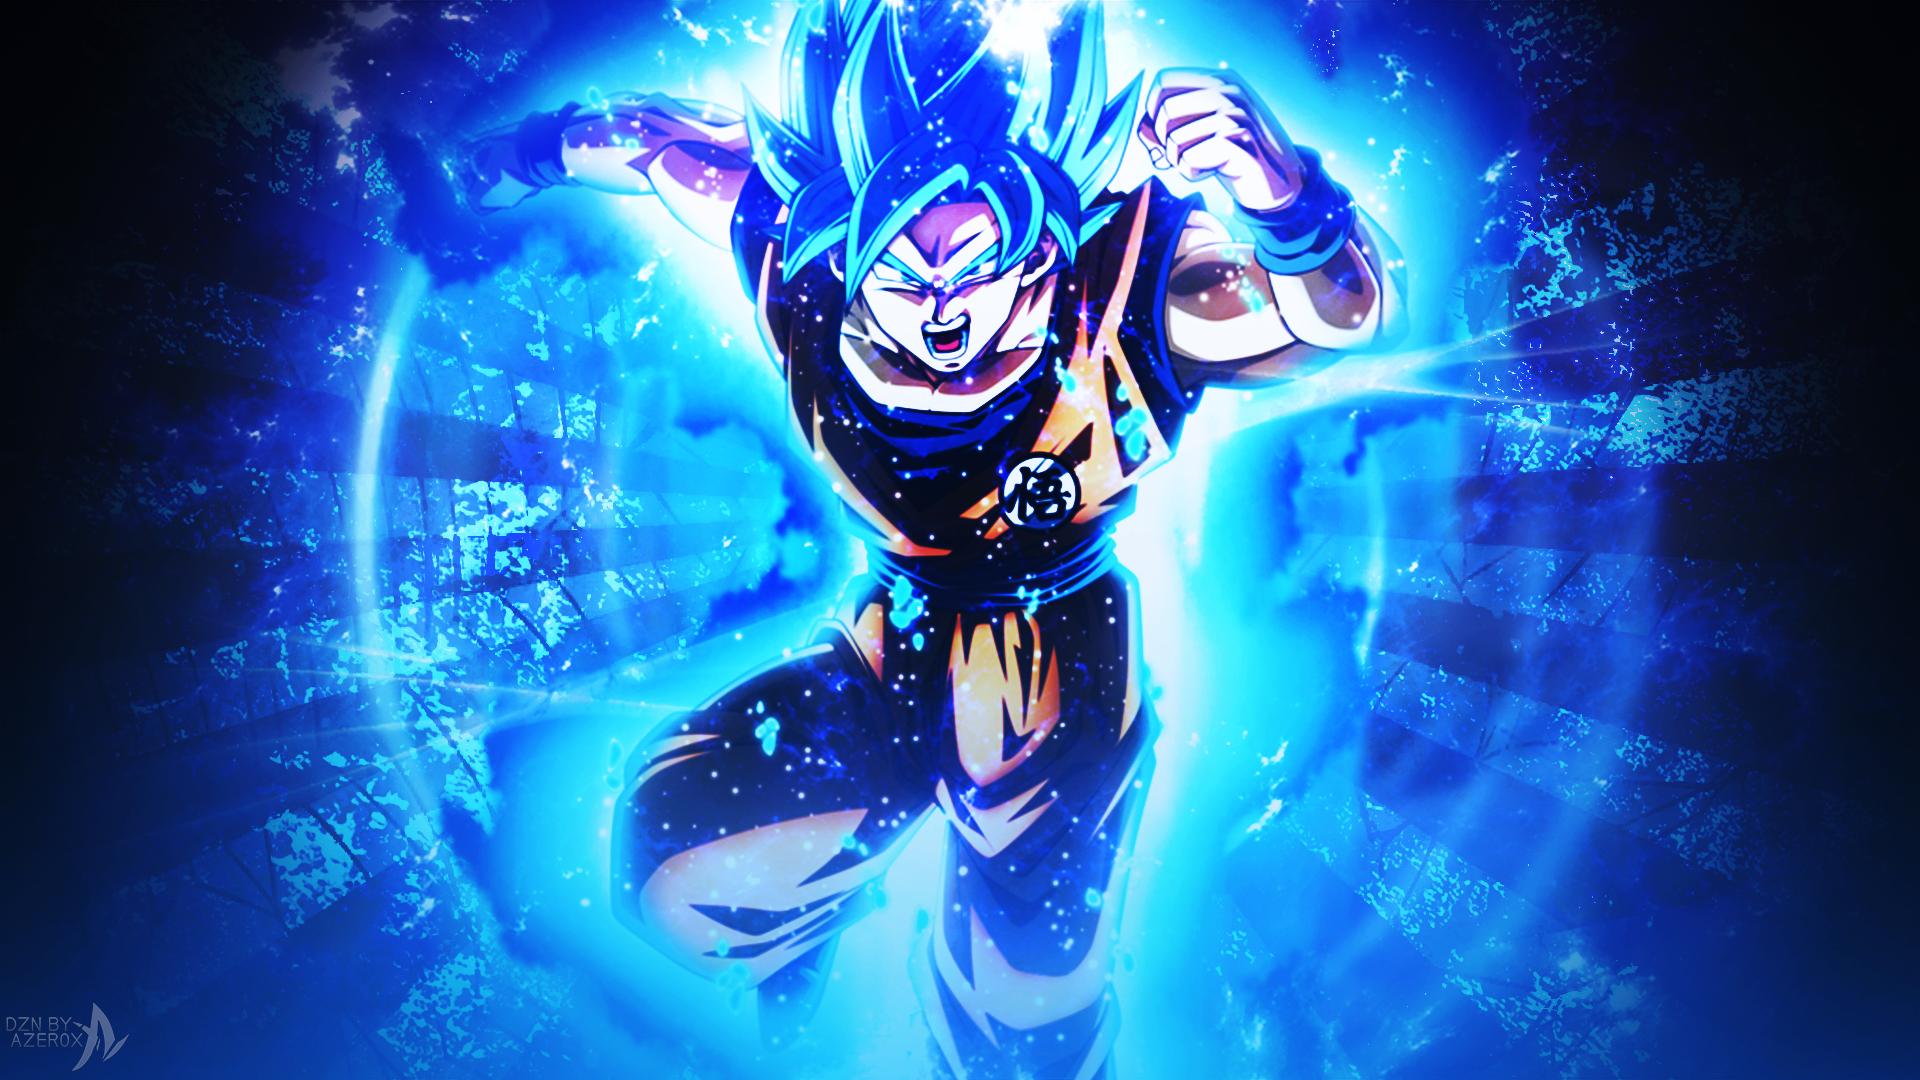 GOKU BLUE (DRAGON BALL SUPER) by TheAZER0X on DeviantArt